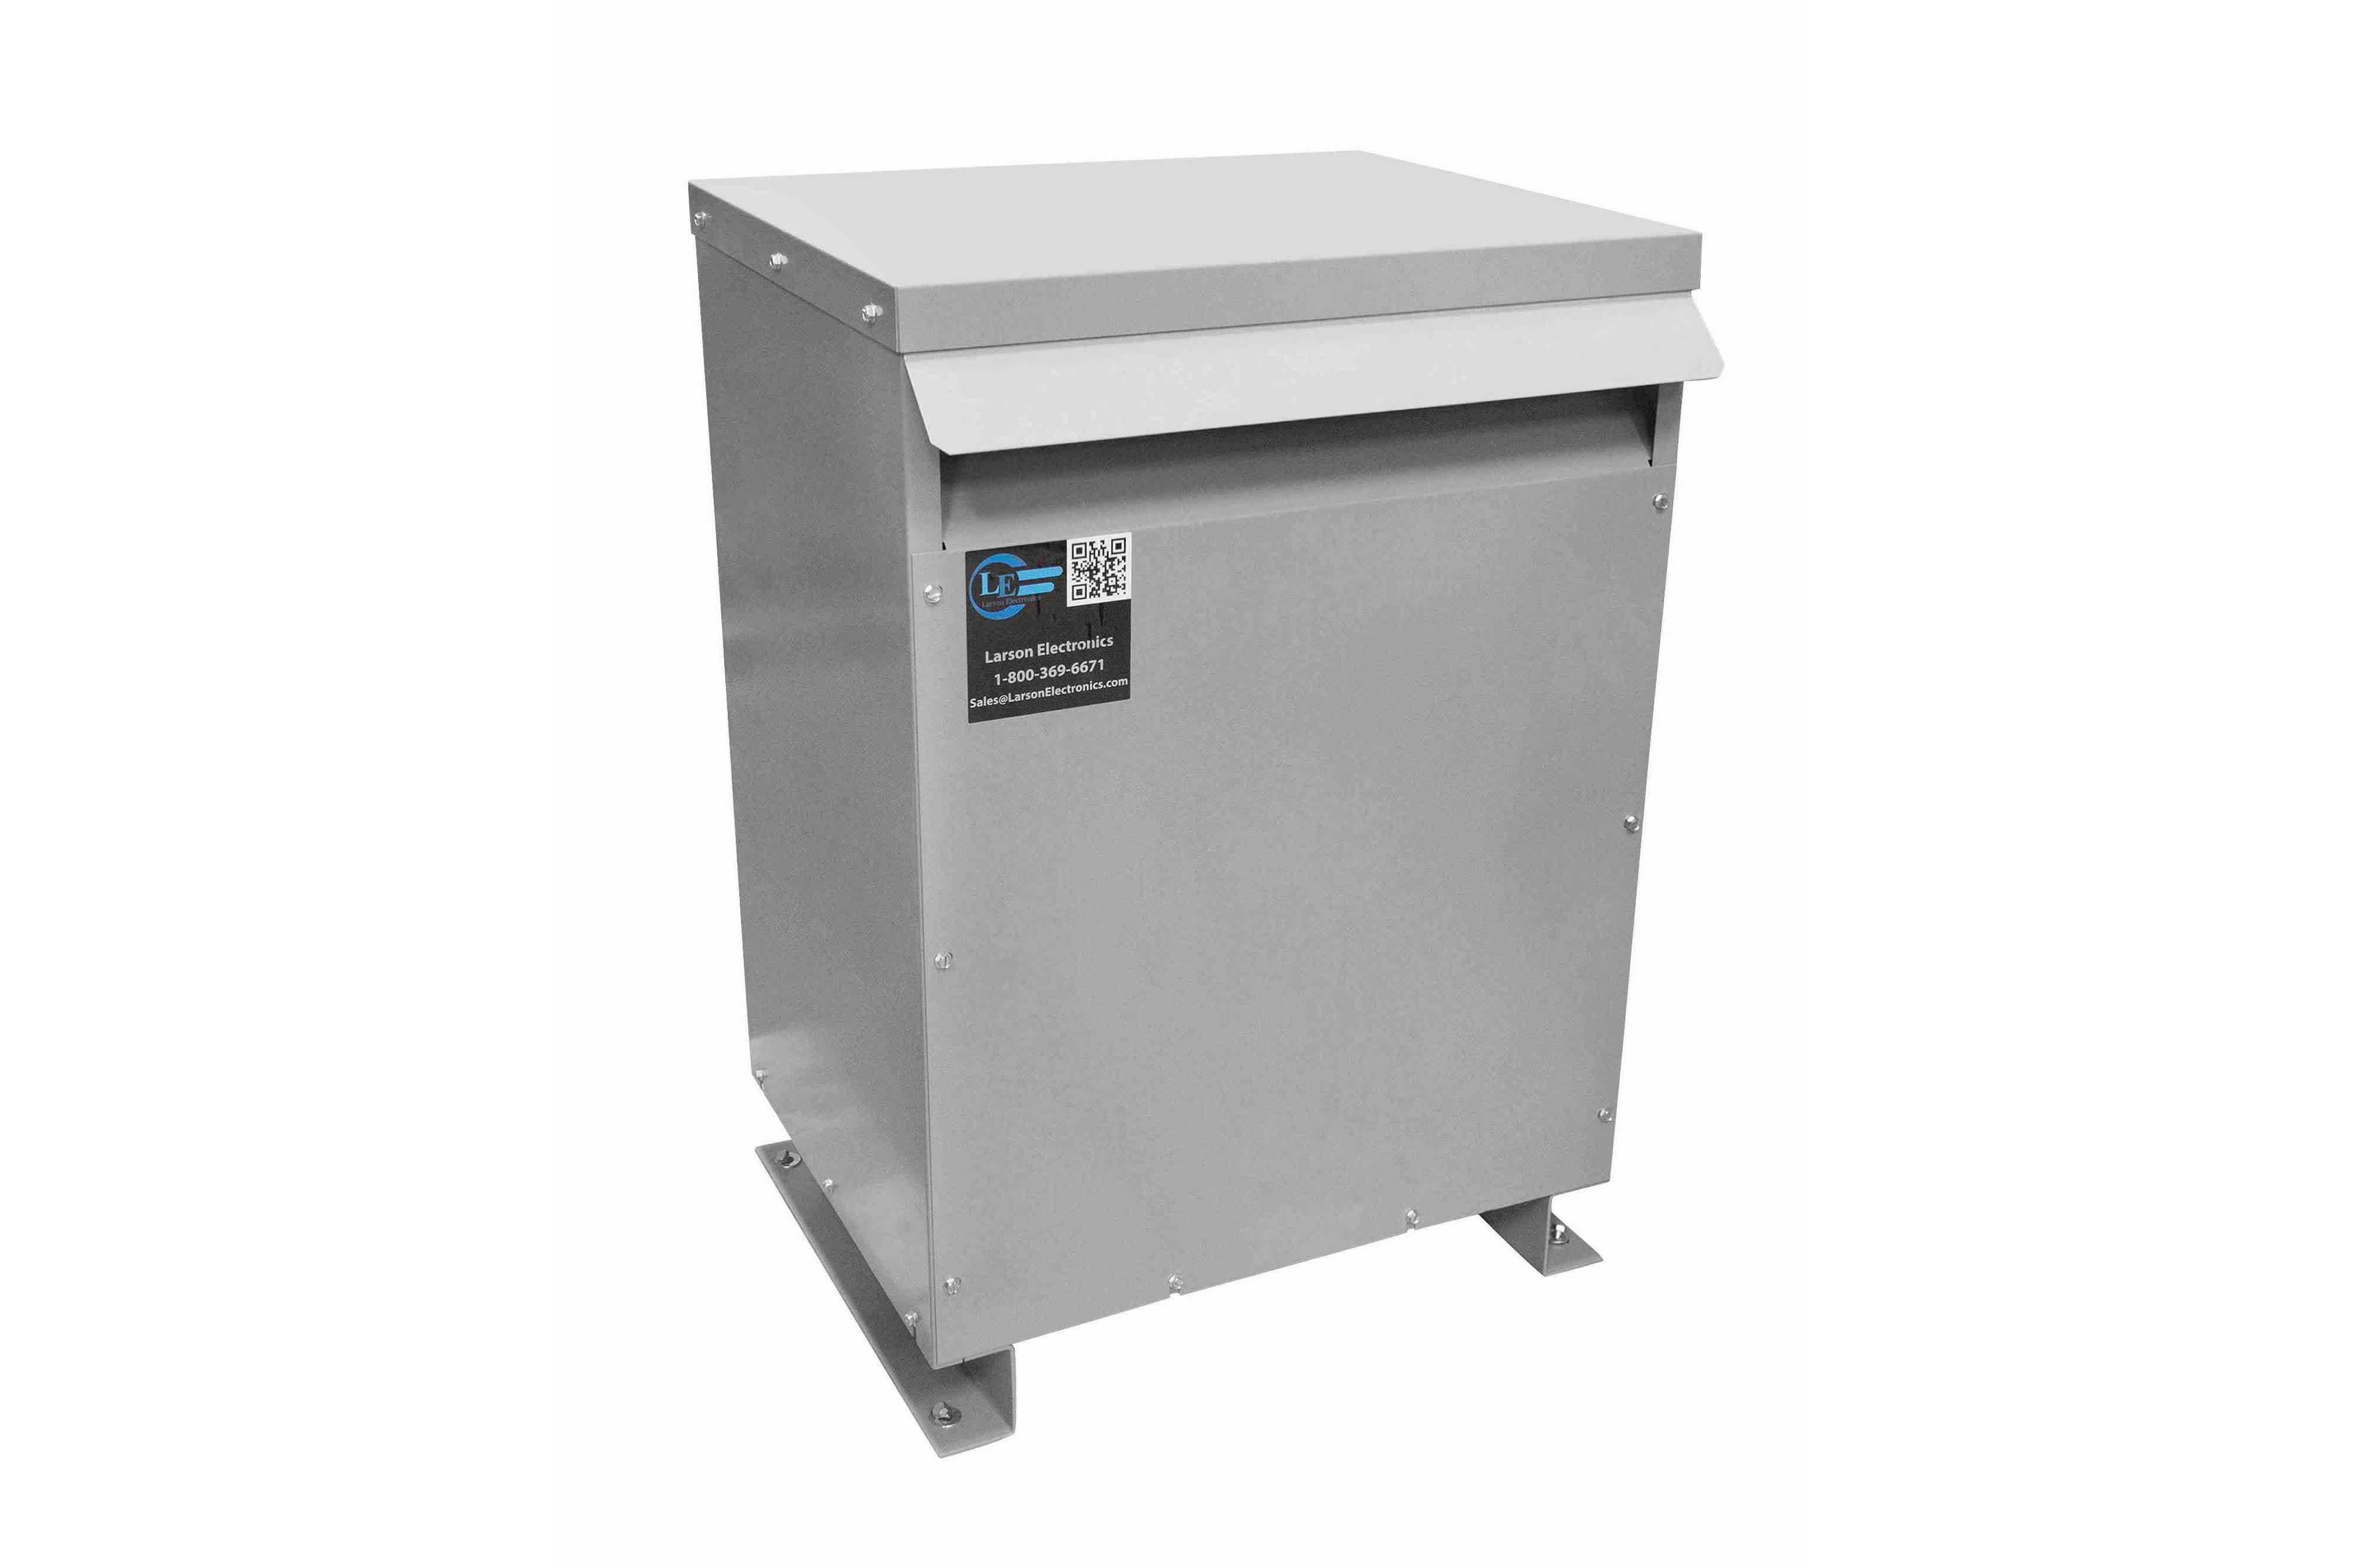 14 kVA 3PH Isolation Transformer, 575V Wye Primary, 240V/120 Delta Secondary, N3R, Ventilated, 60 Hz